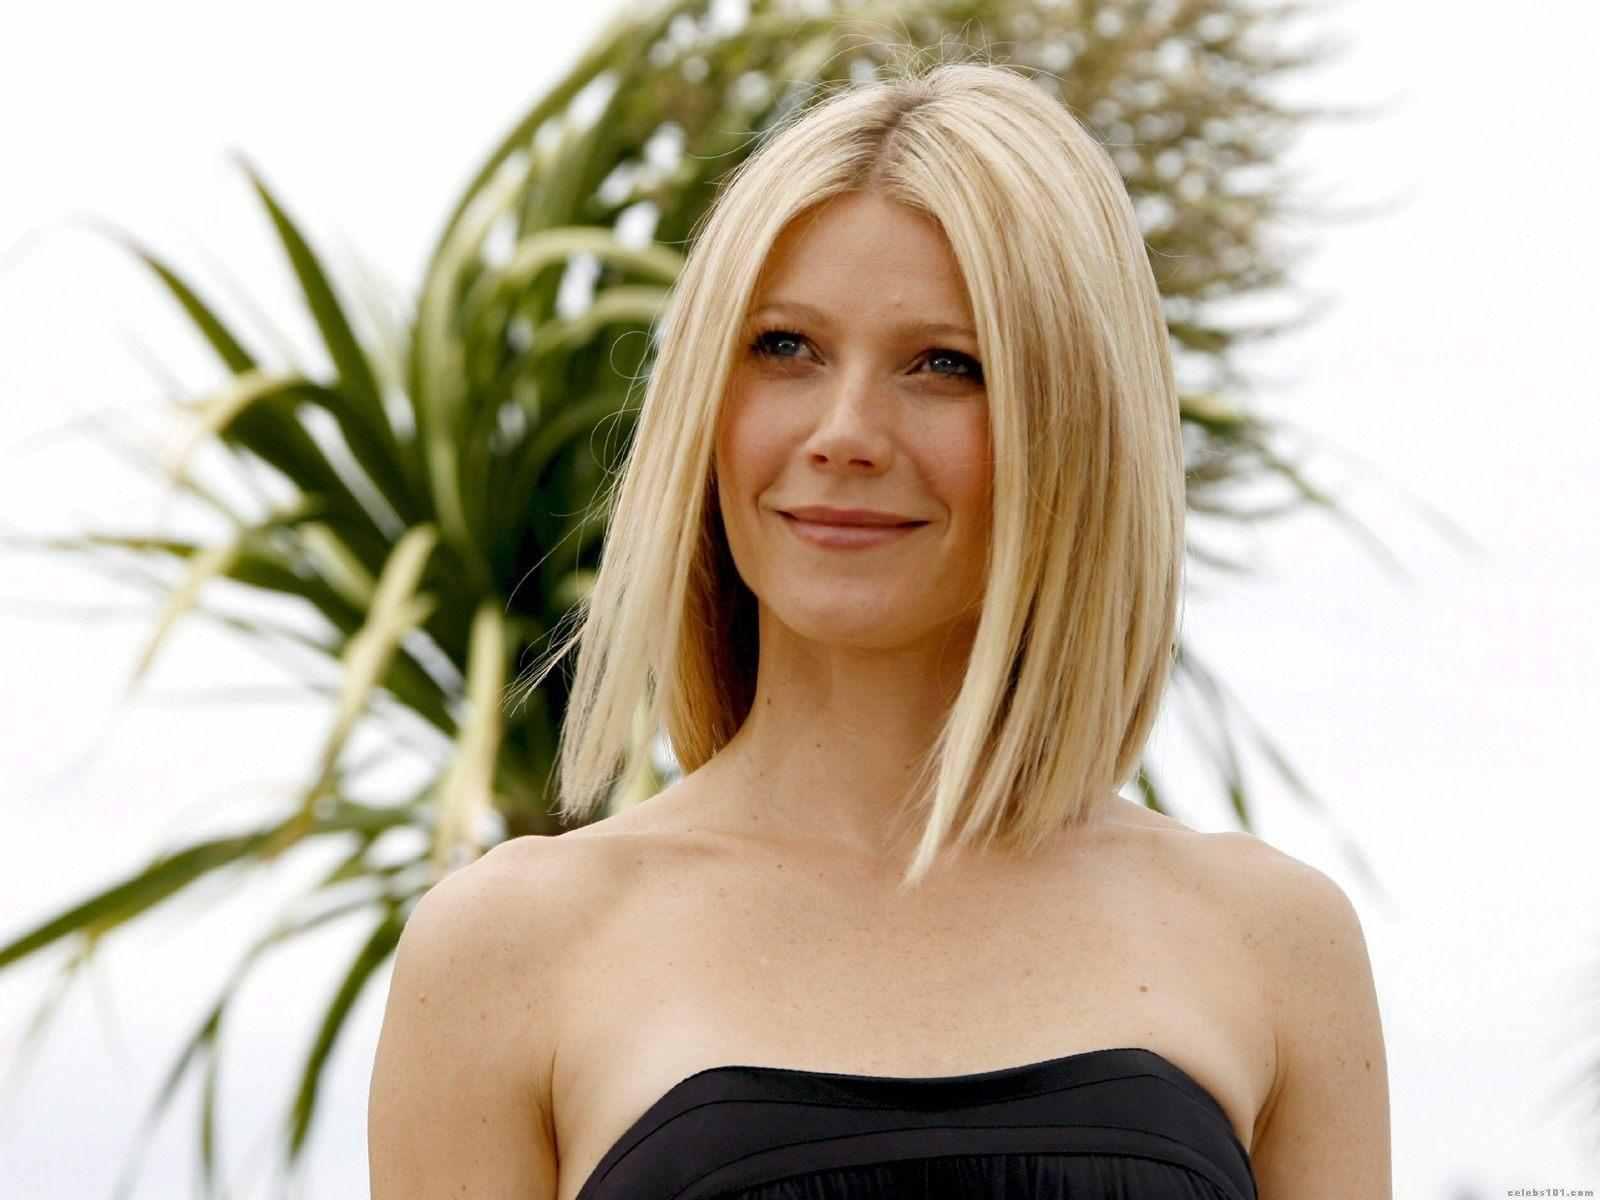 http://2.bp.blogspot.com/-kOnnCrJWrWE/TmSoWYQKbCI/AAAAAAAAAMk/qdur-s67Ap0/s1600/Gwyneth_Paltrow.jpg